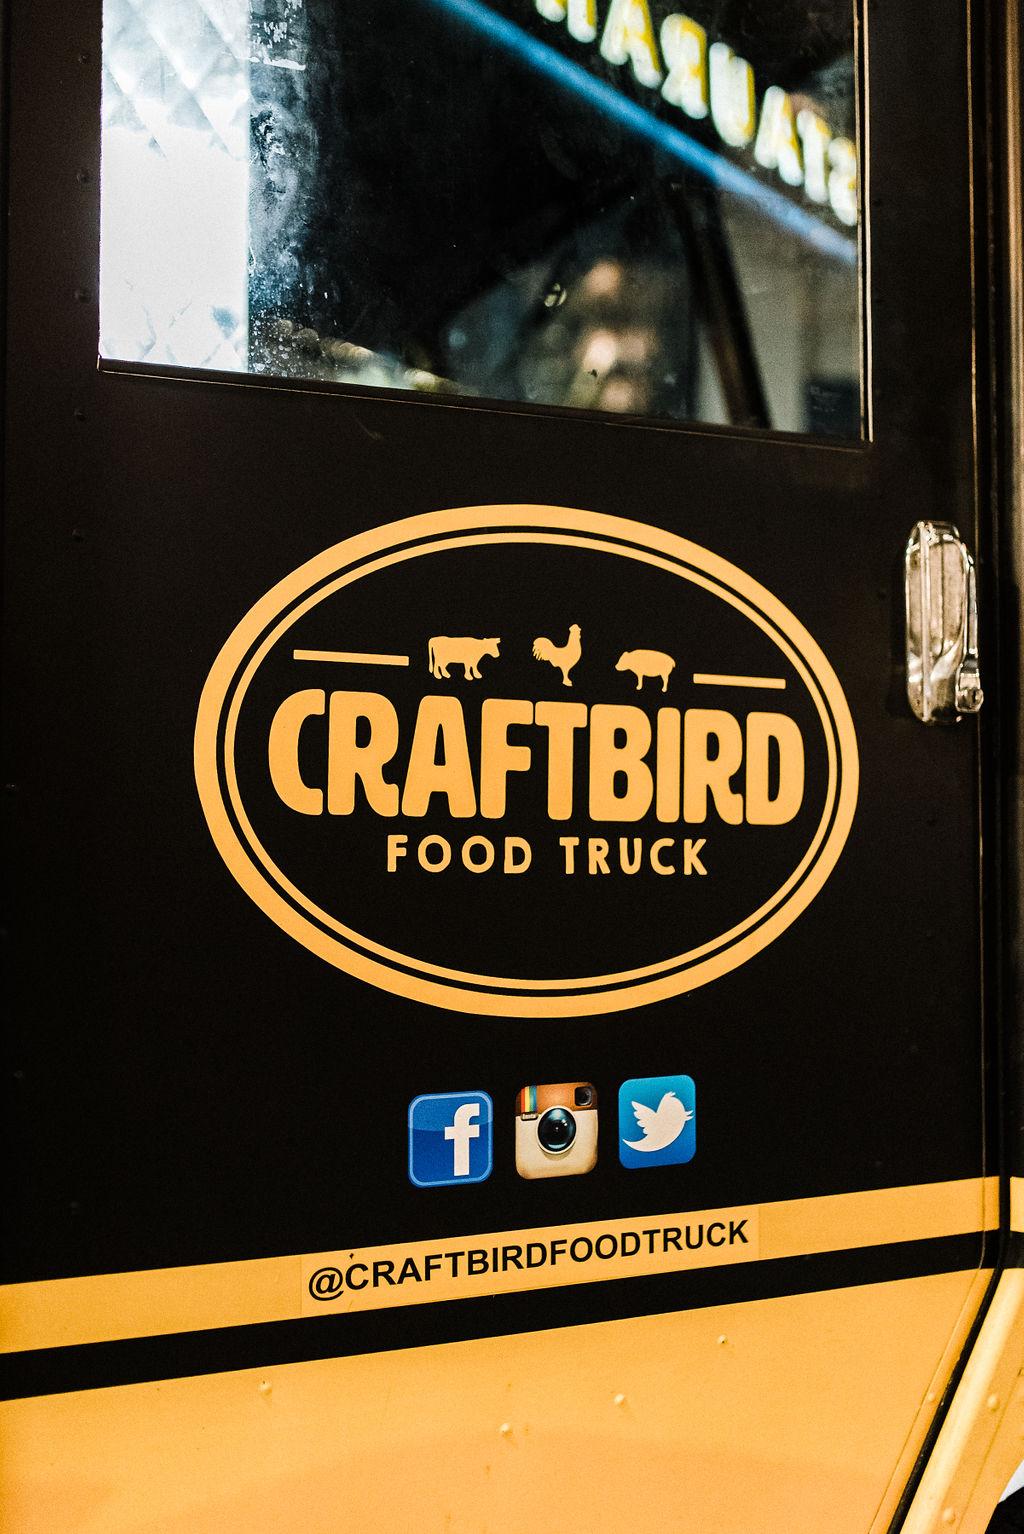 Craft Bird Food Truck for late night wedding snacks in Hartford, CT - Pearl Weddings & Events